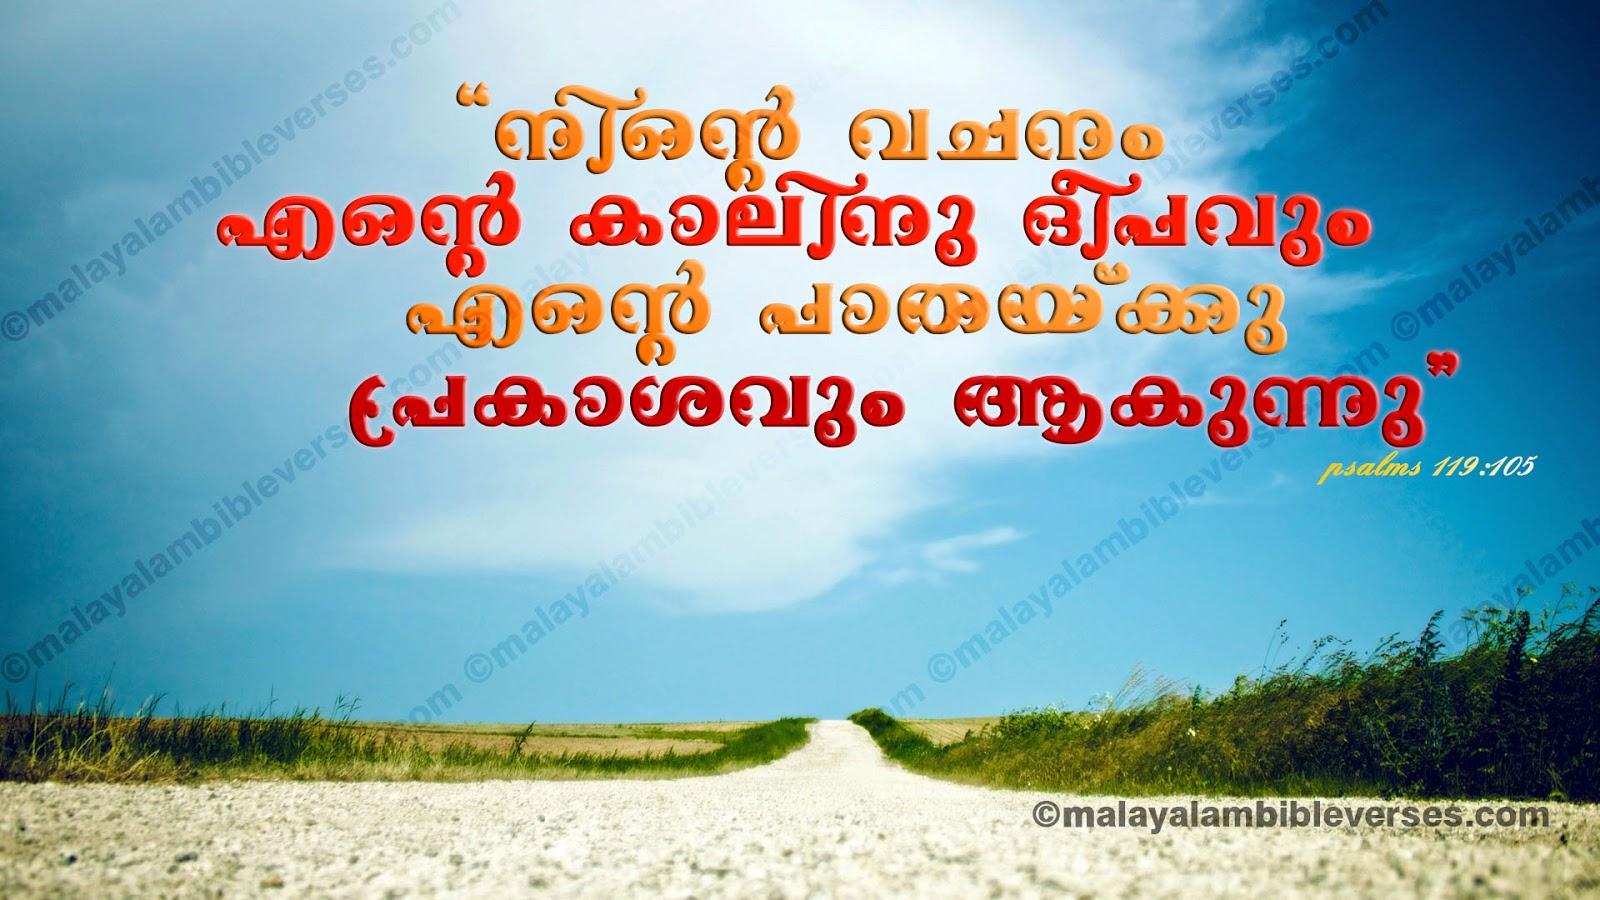 - Malayalam bible words images ...